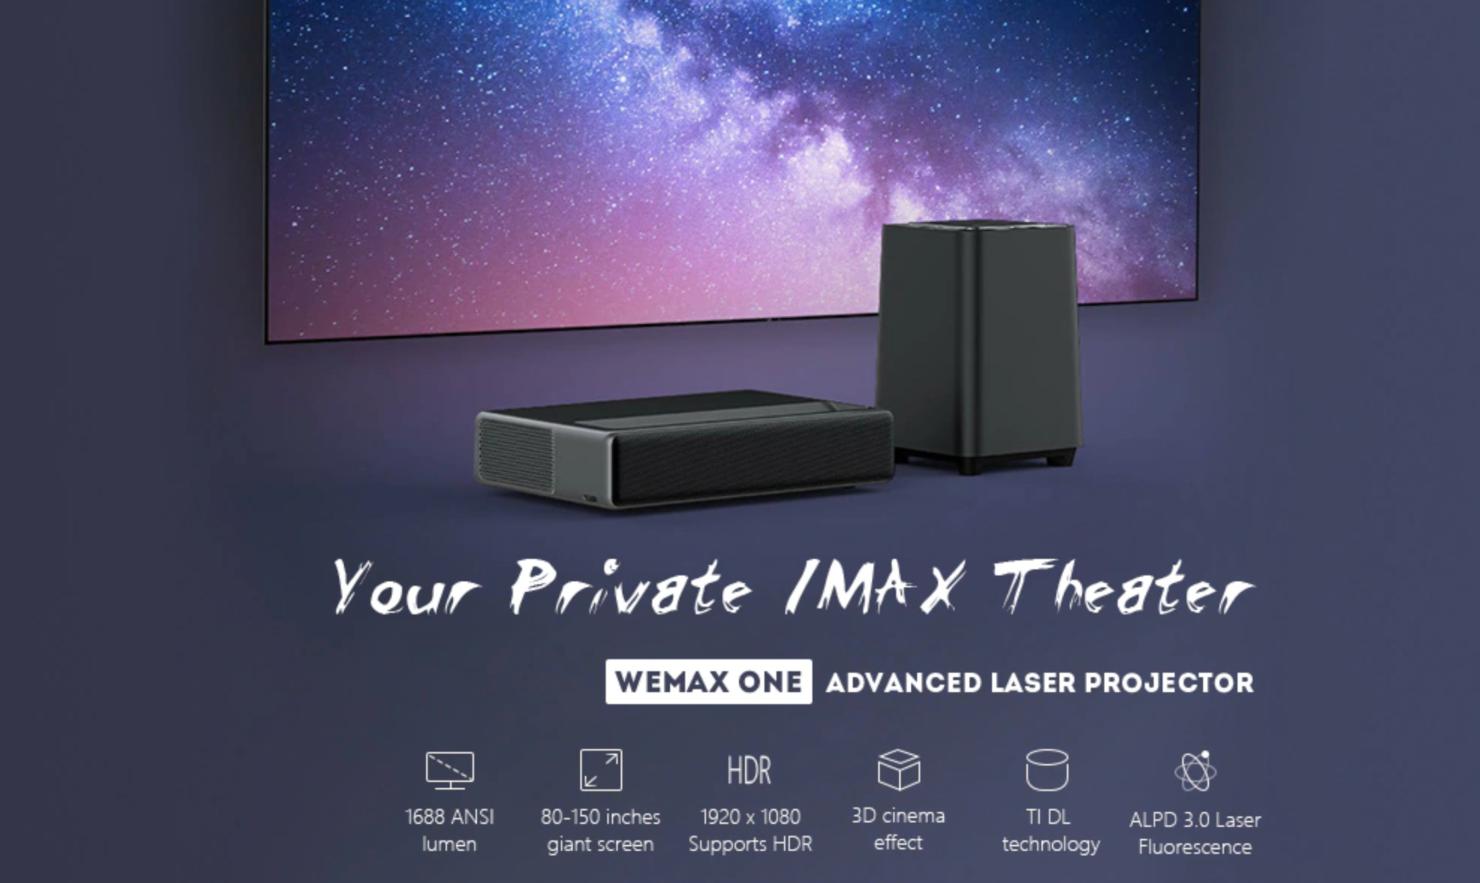 wemax-one-pro-4